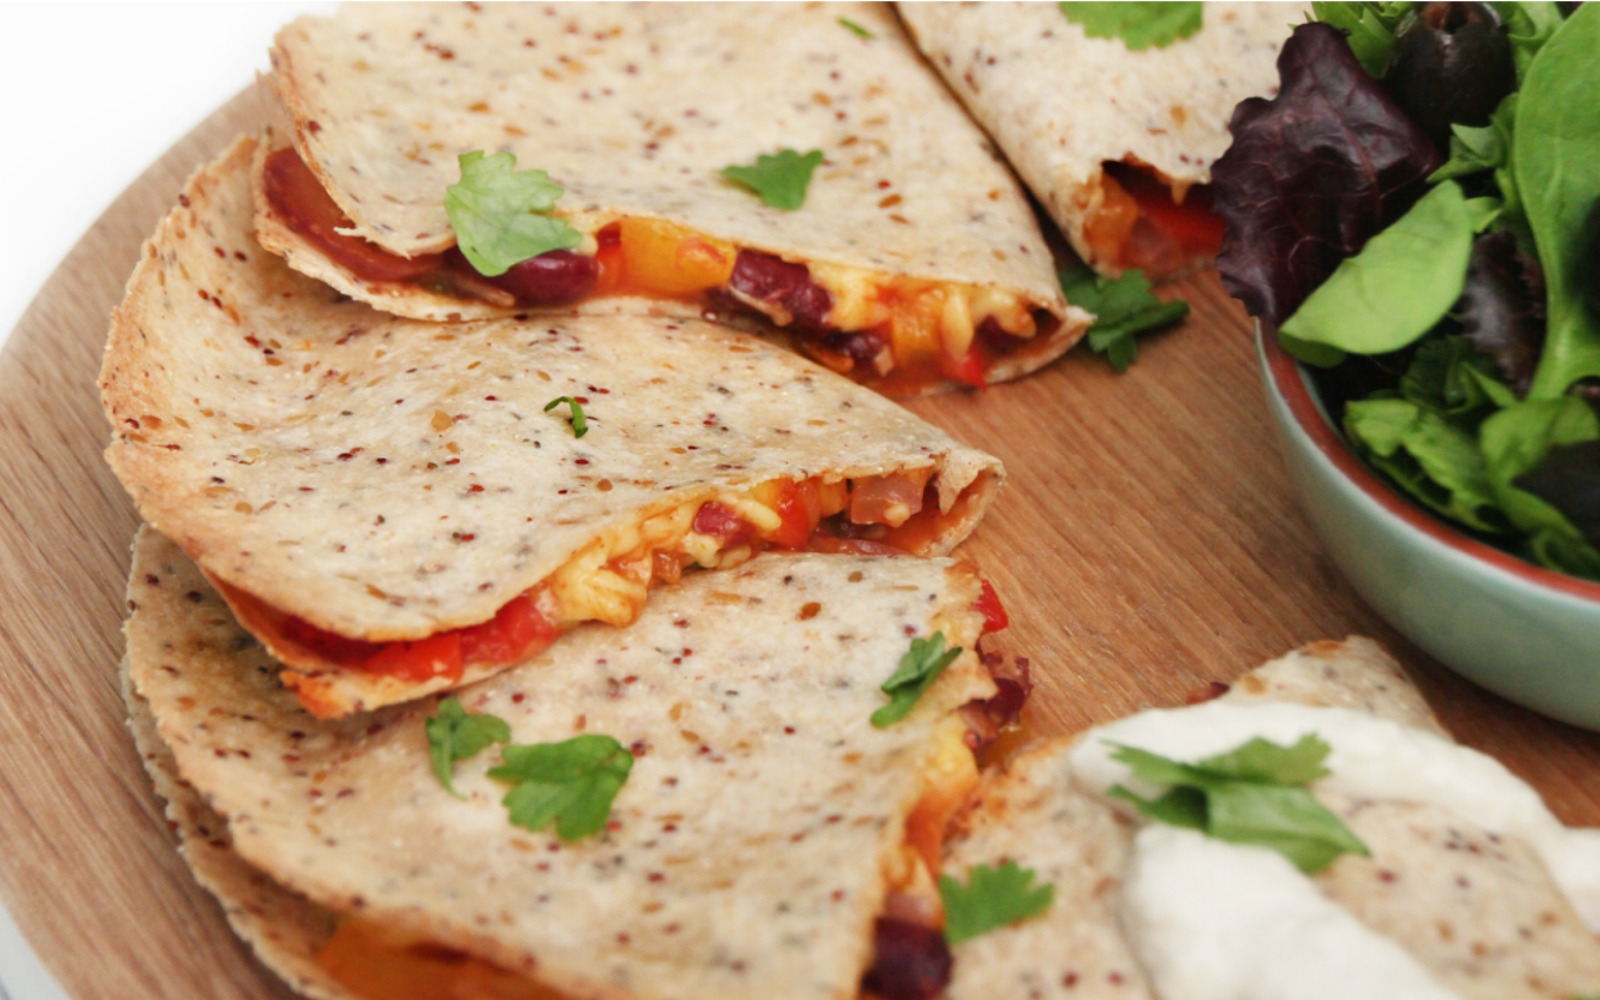 Spicy Quesadillas [Vegan, Gluten Free]